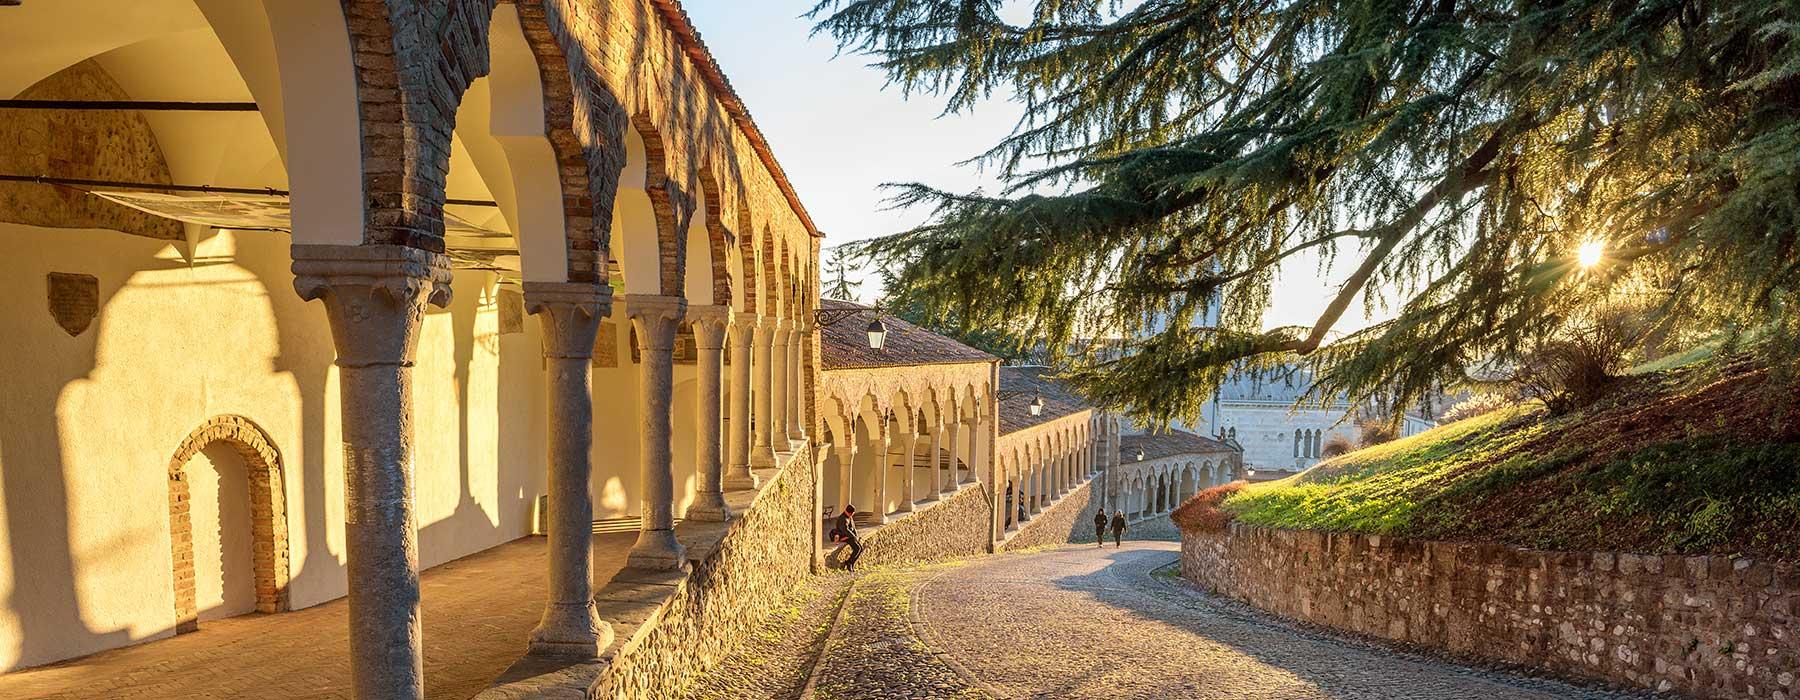 Udine – smuk universitetsby